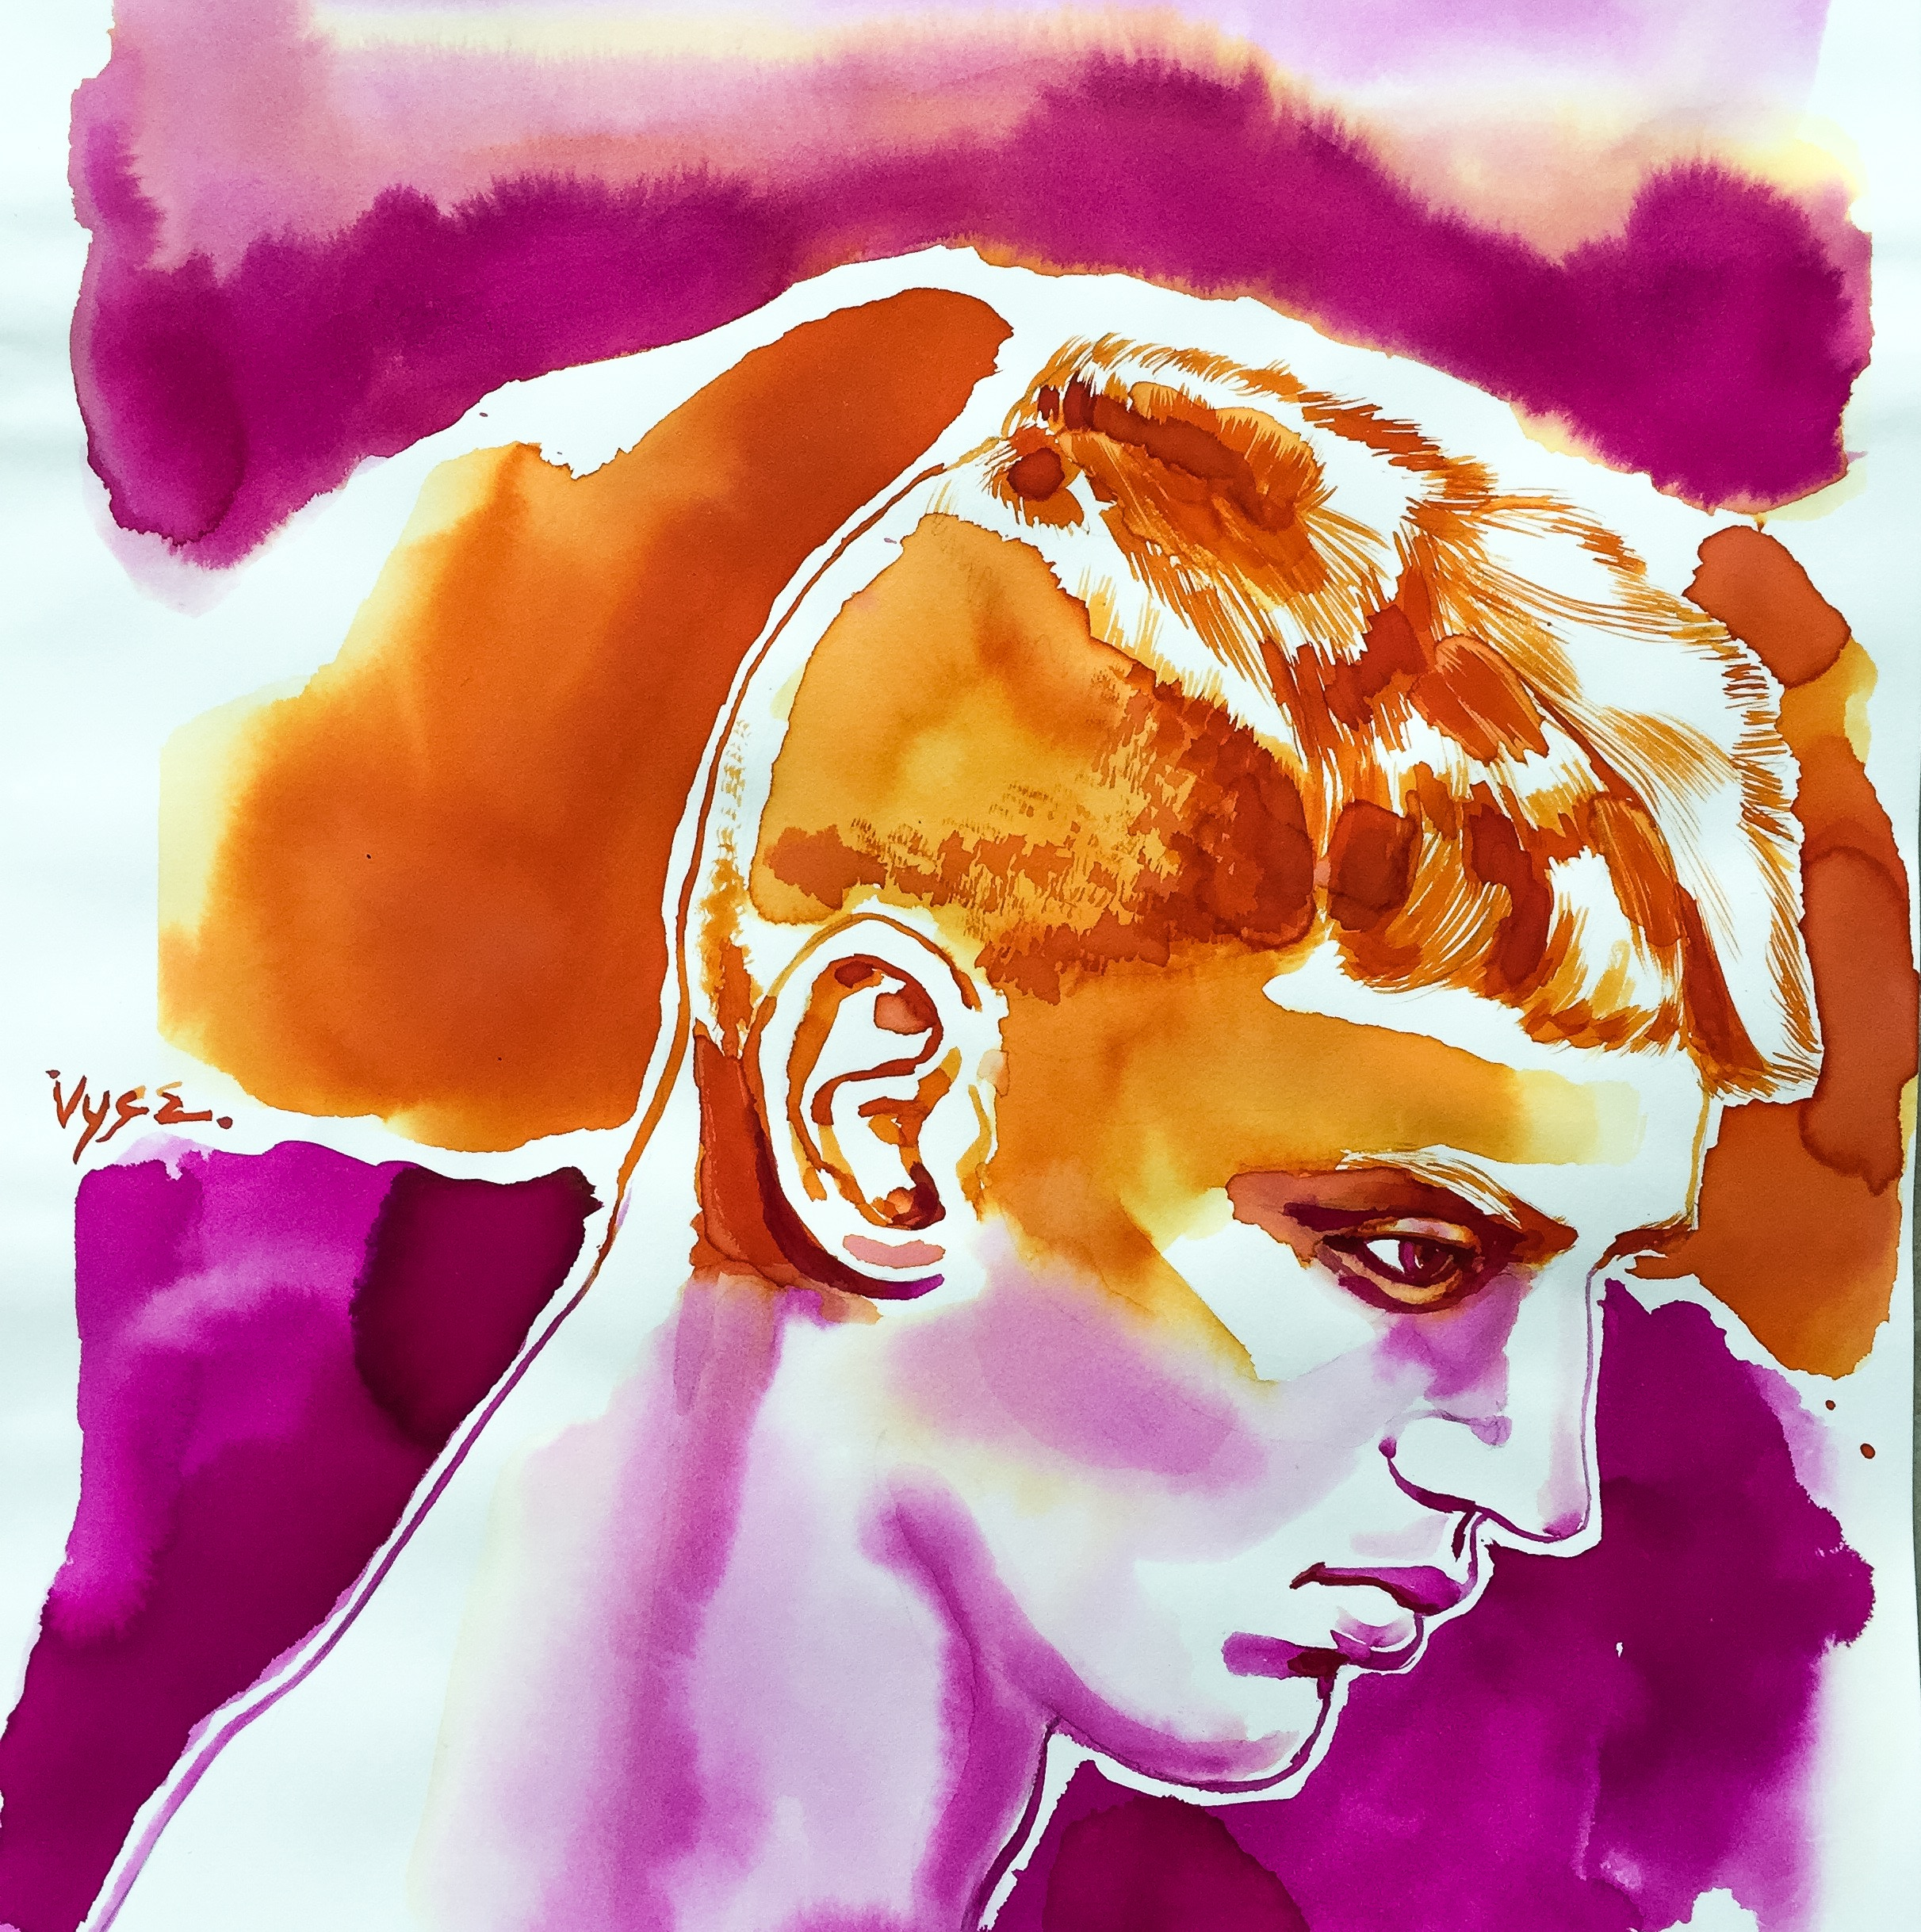 """Man Profiled Imagined"" by Richard Vyse"